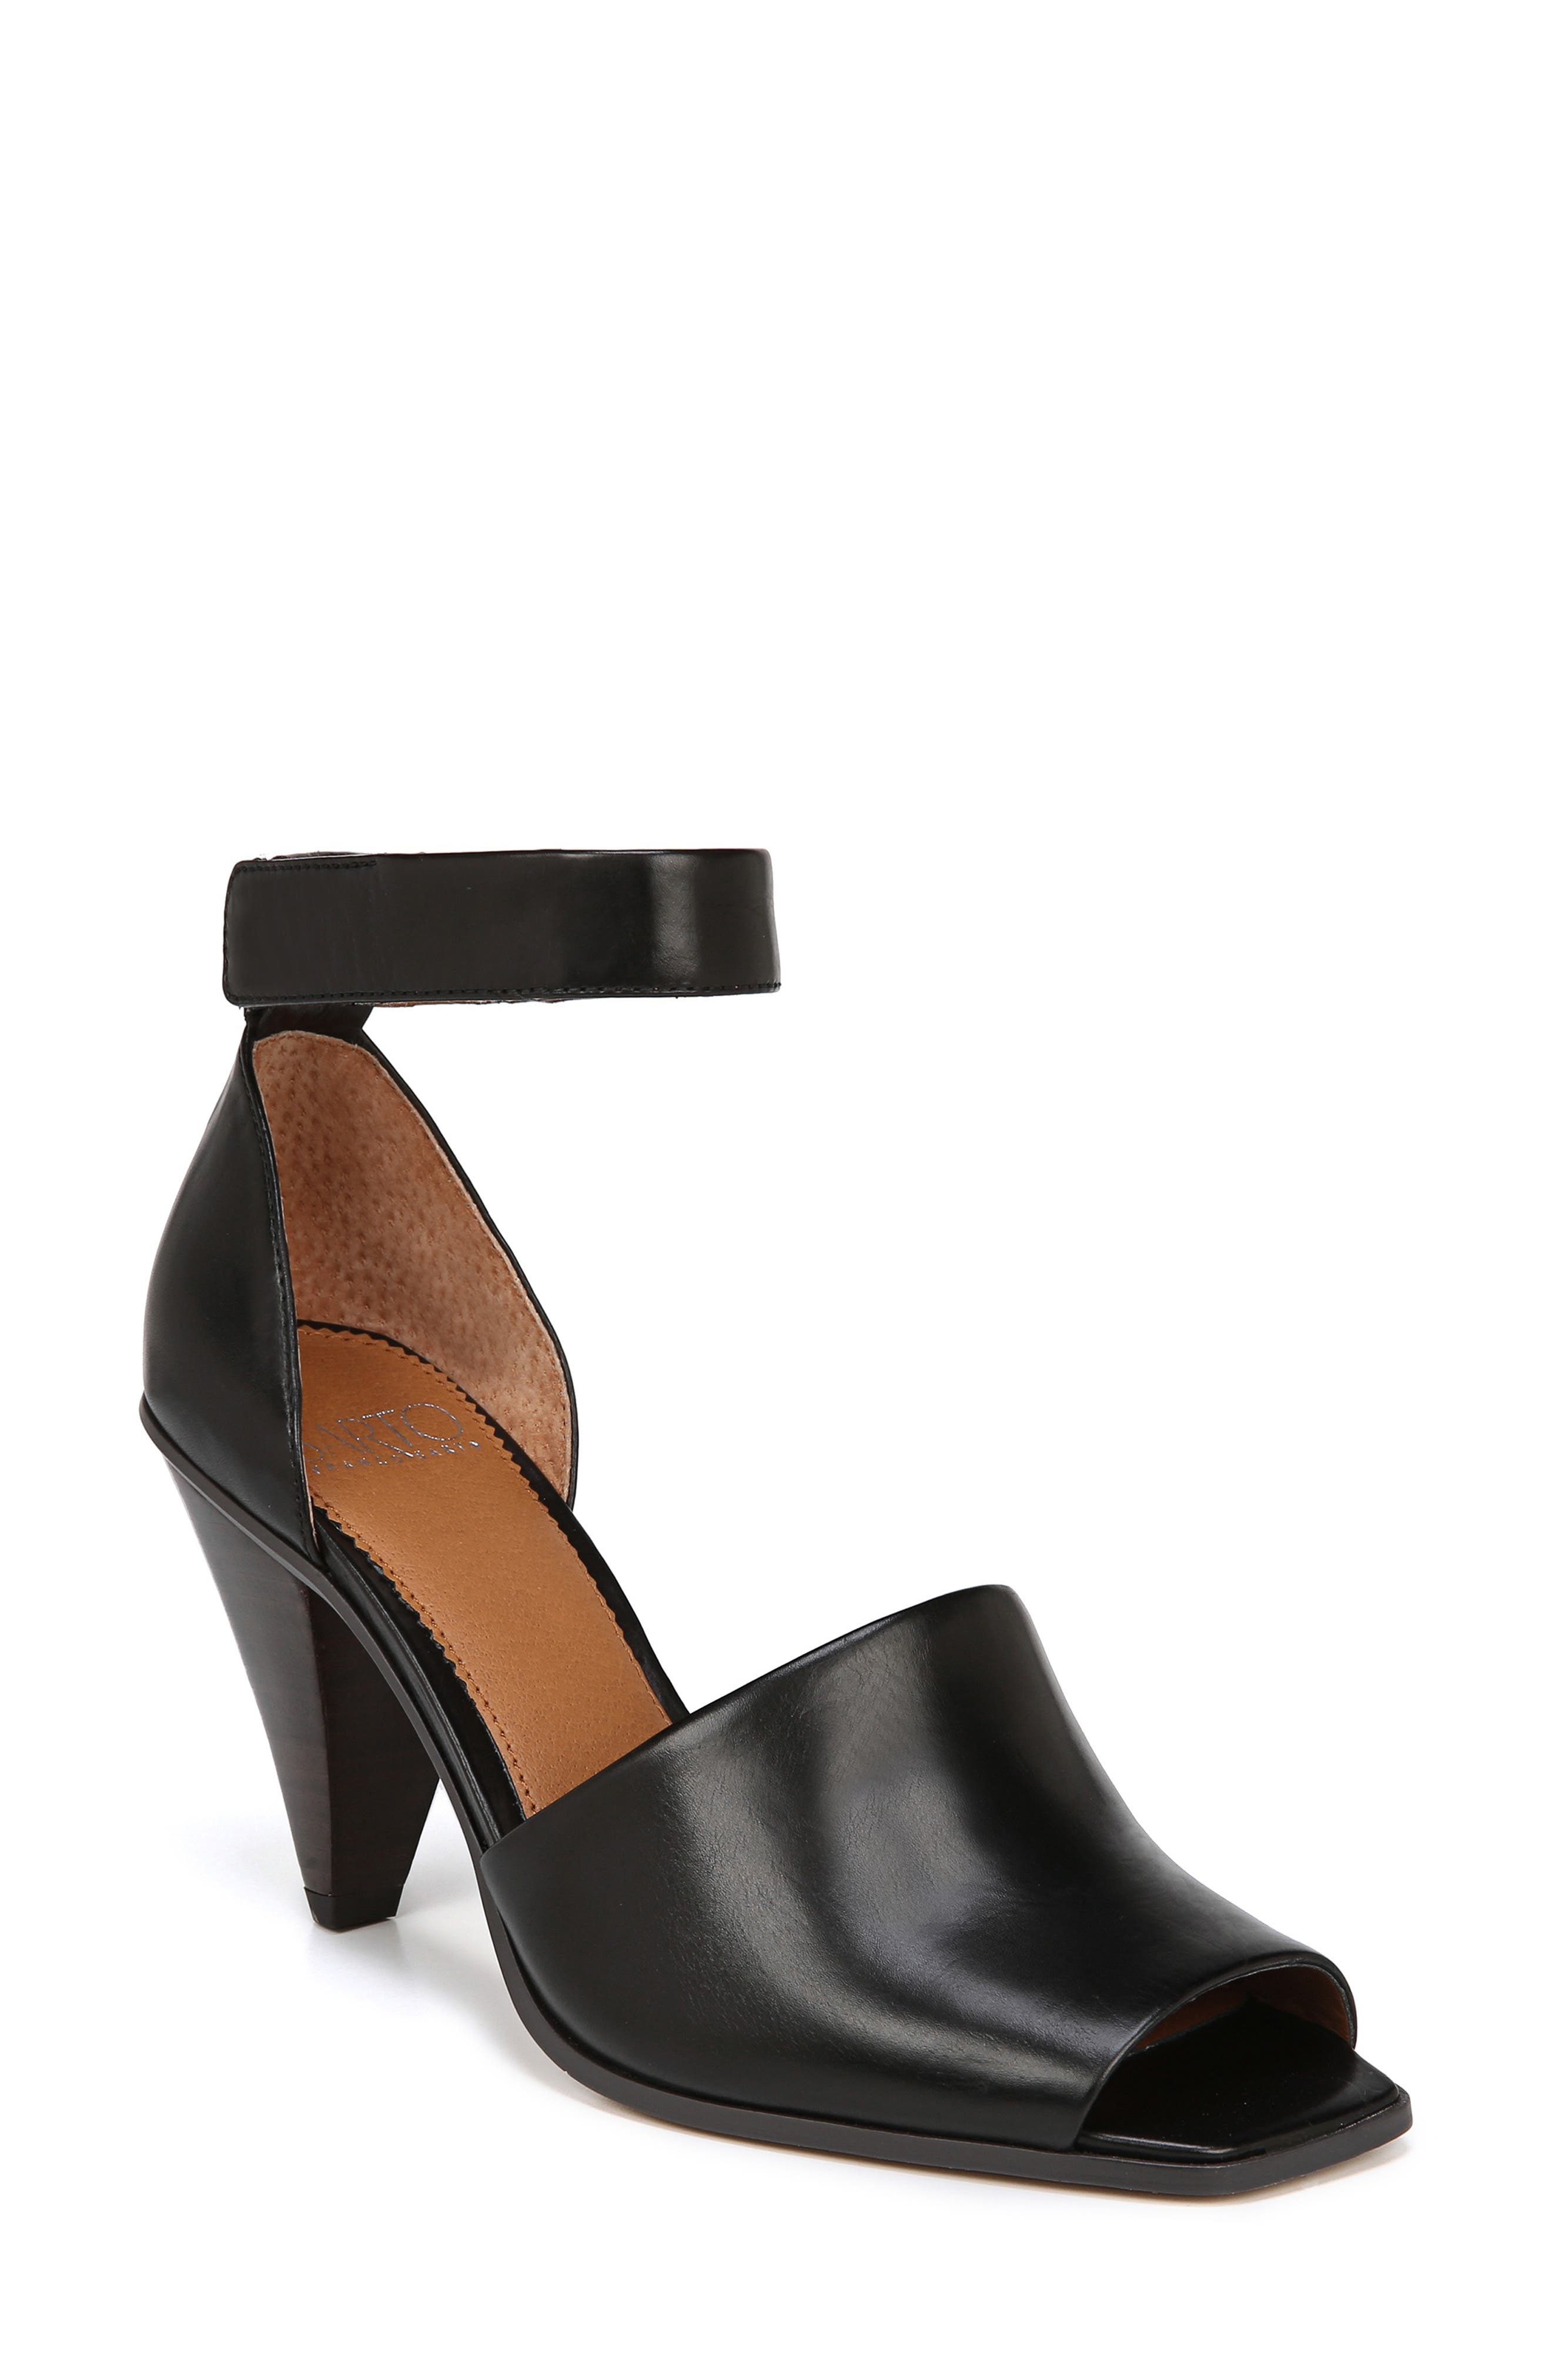 SARTO BY FRANCO SARTO, Ankle Strap Sandal, Main thumbnail 1, color, BLACK FOULARD LEATHER